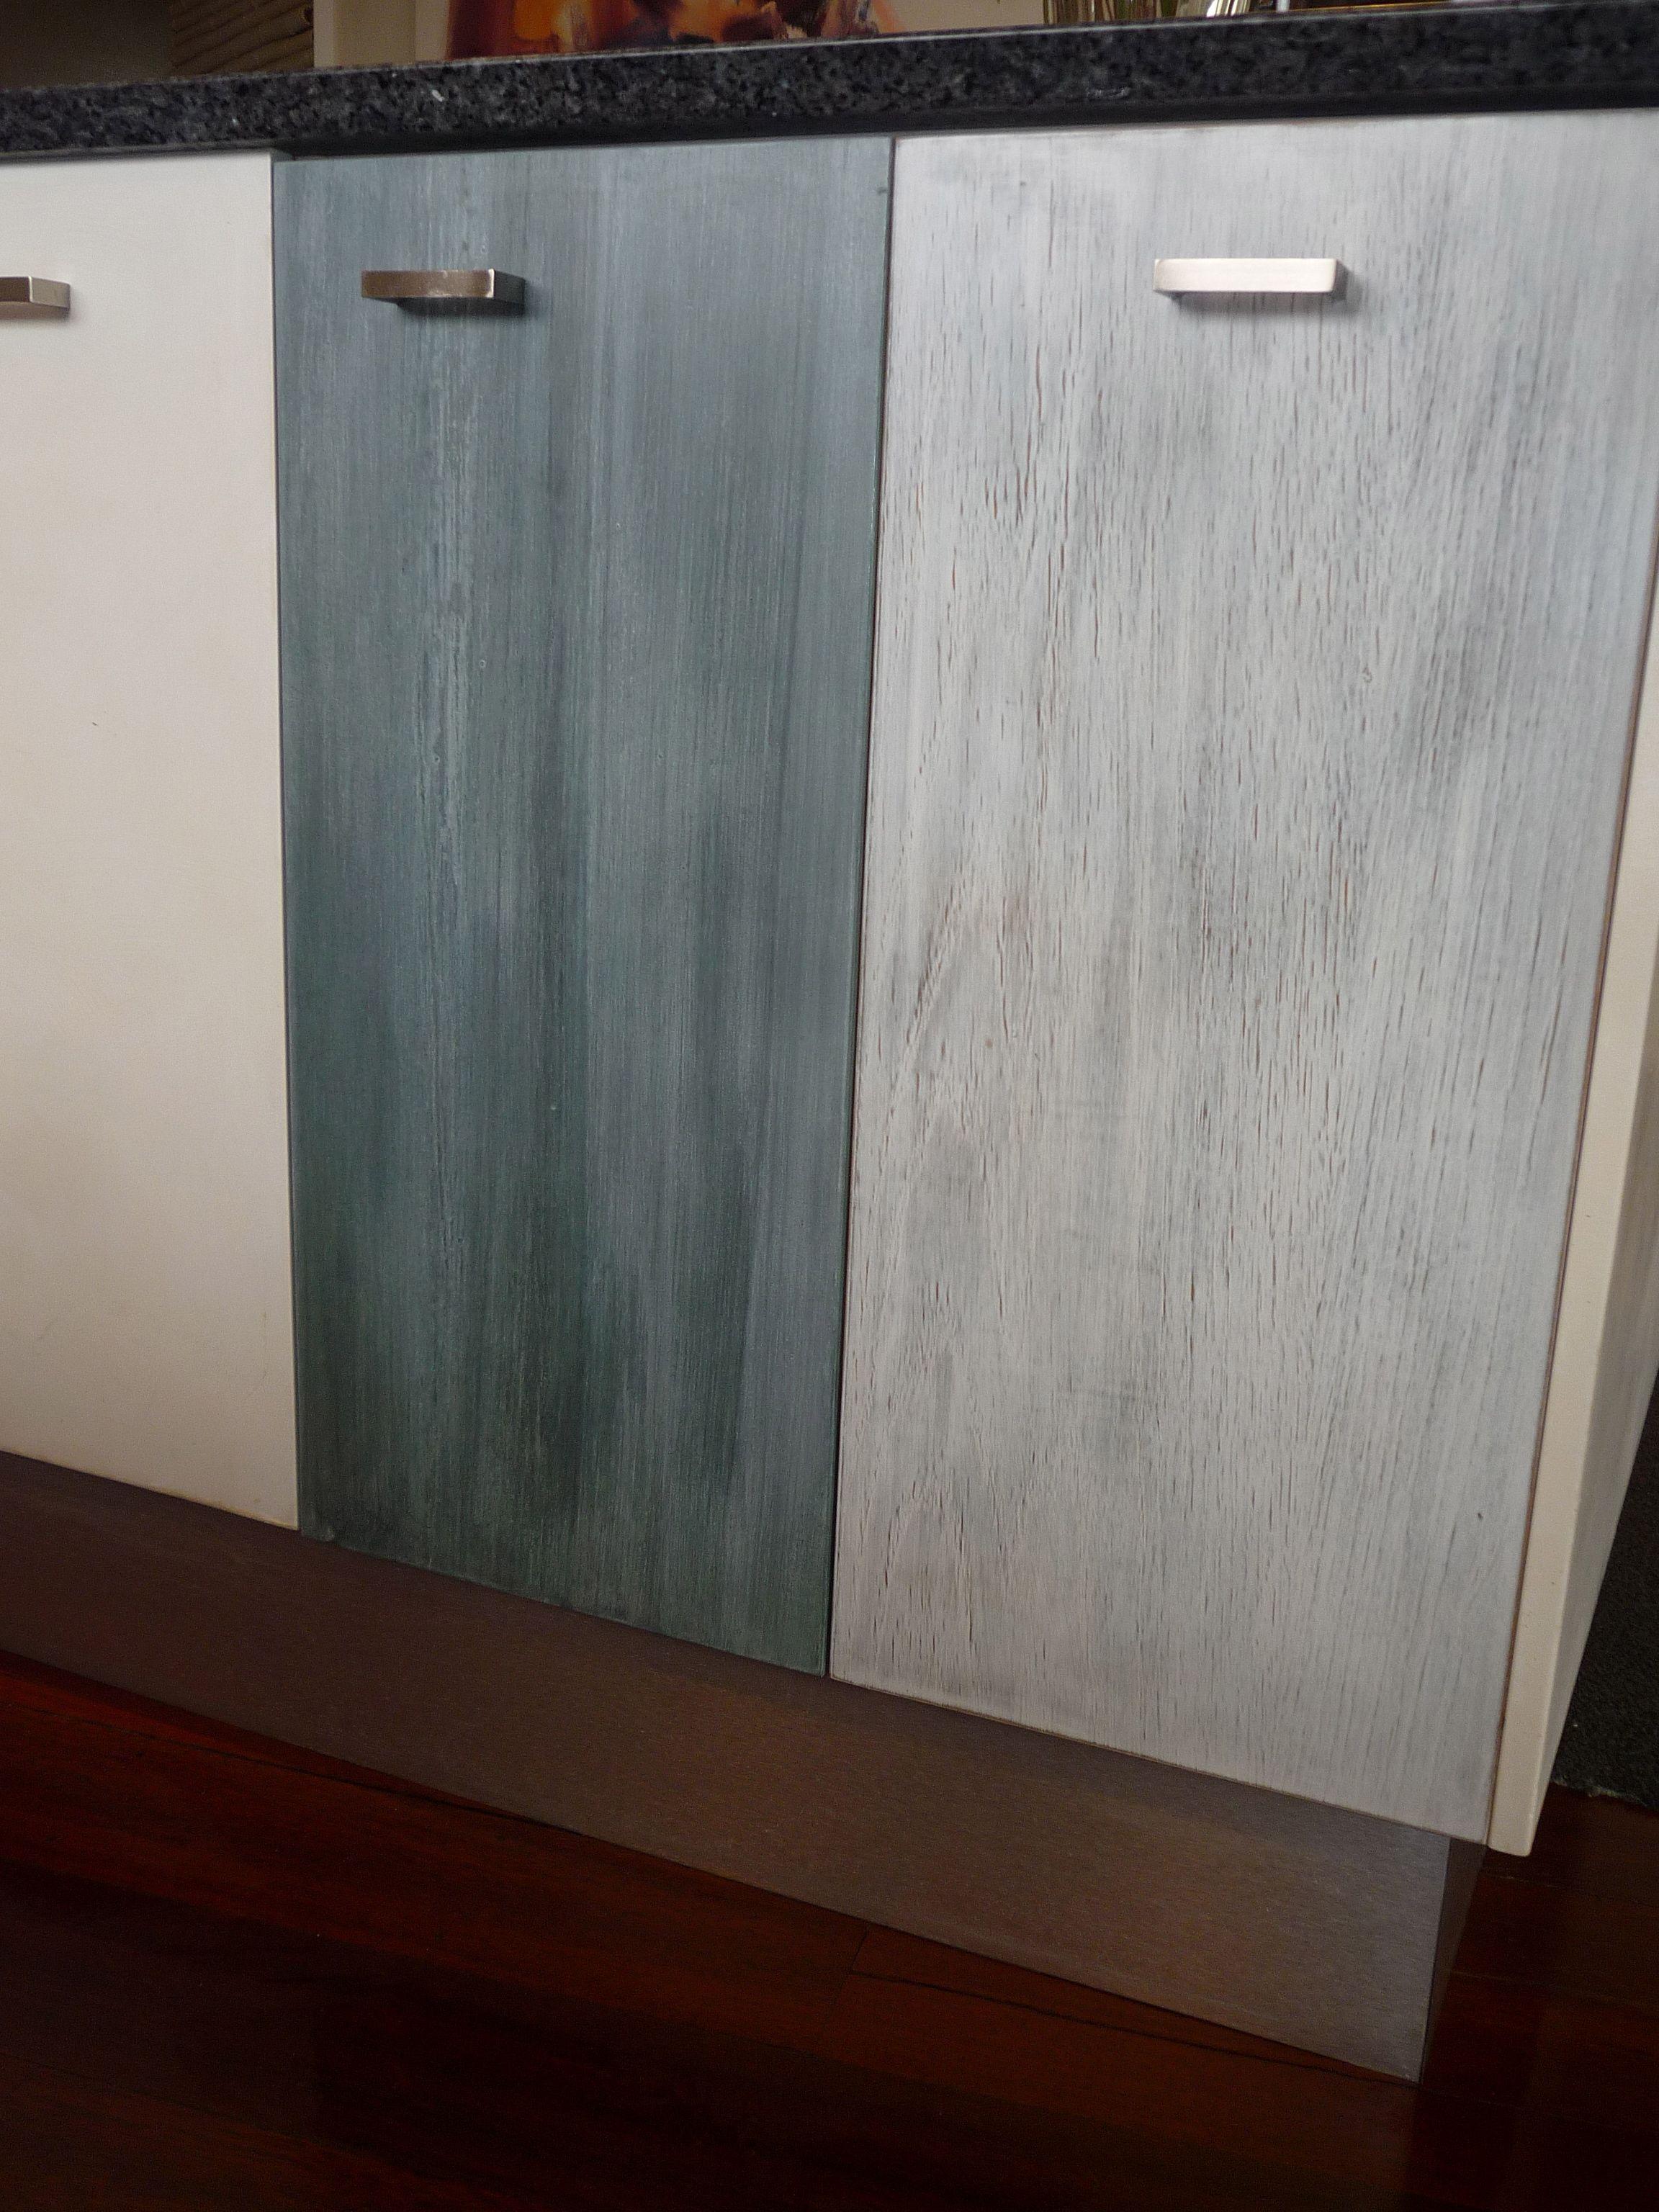 Kitchen Cupboards In Limed Oak And Aged Zinc Finish Porter S Paints Porter Paint Copper Paint Door Handles